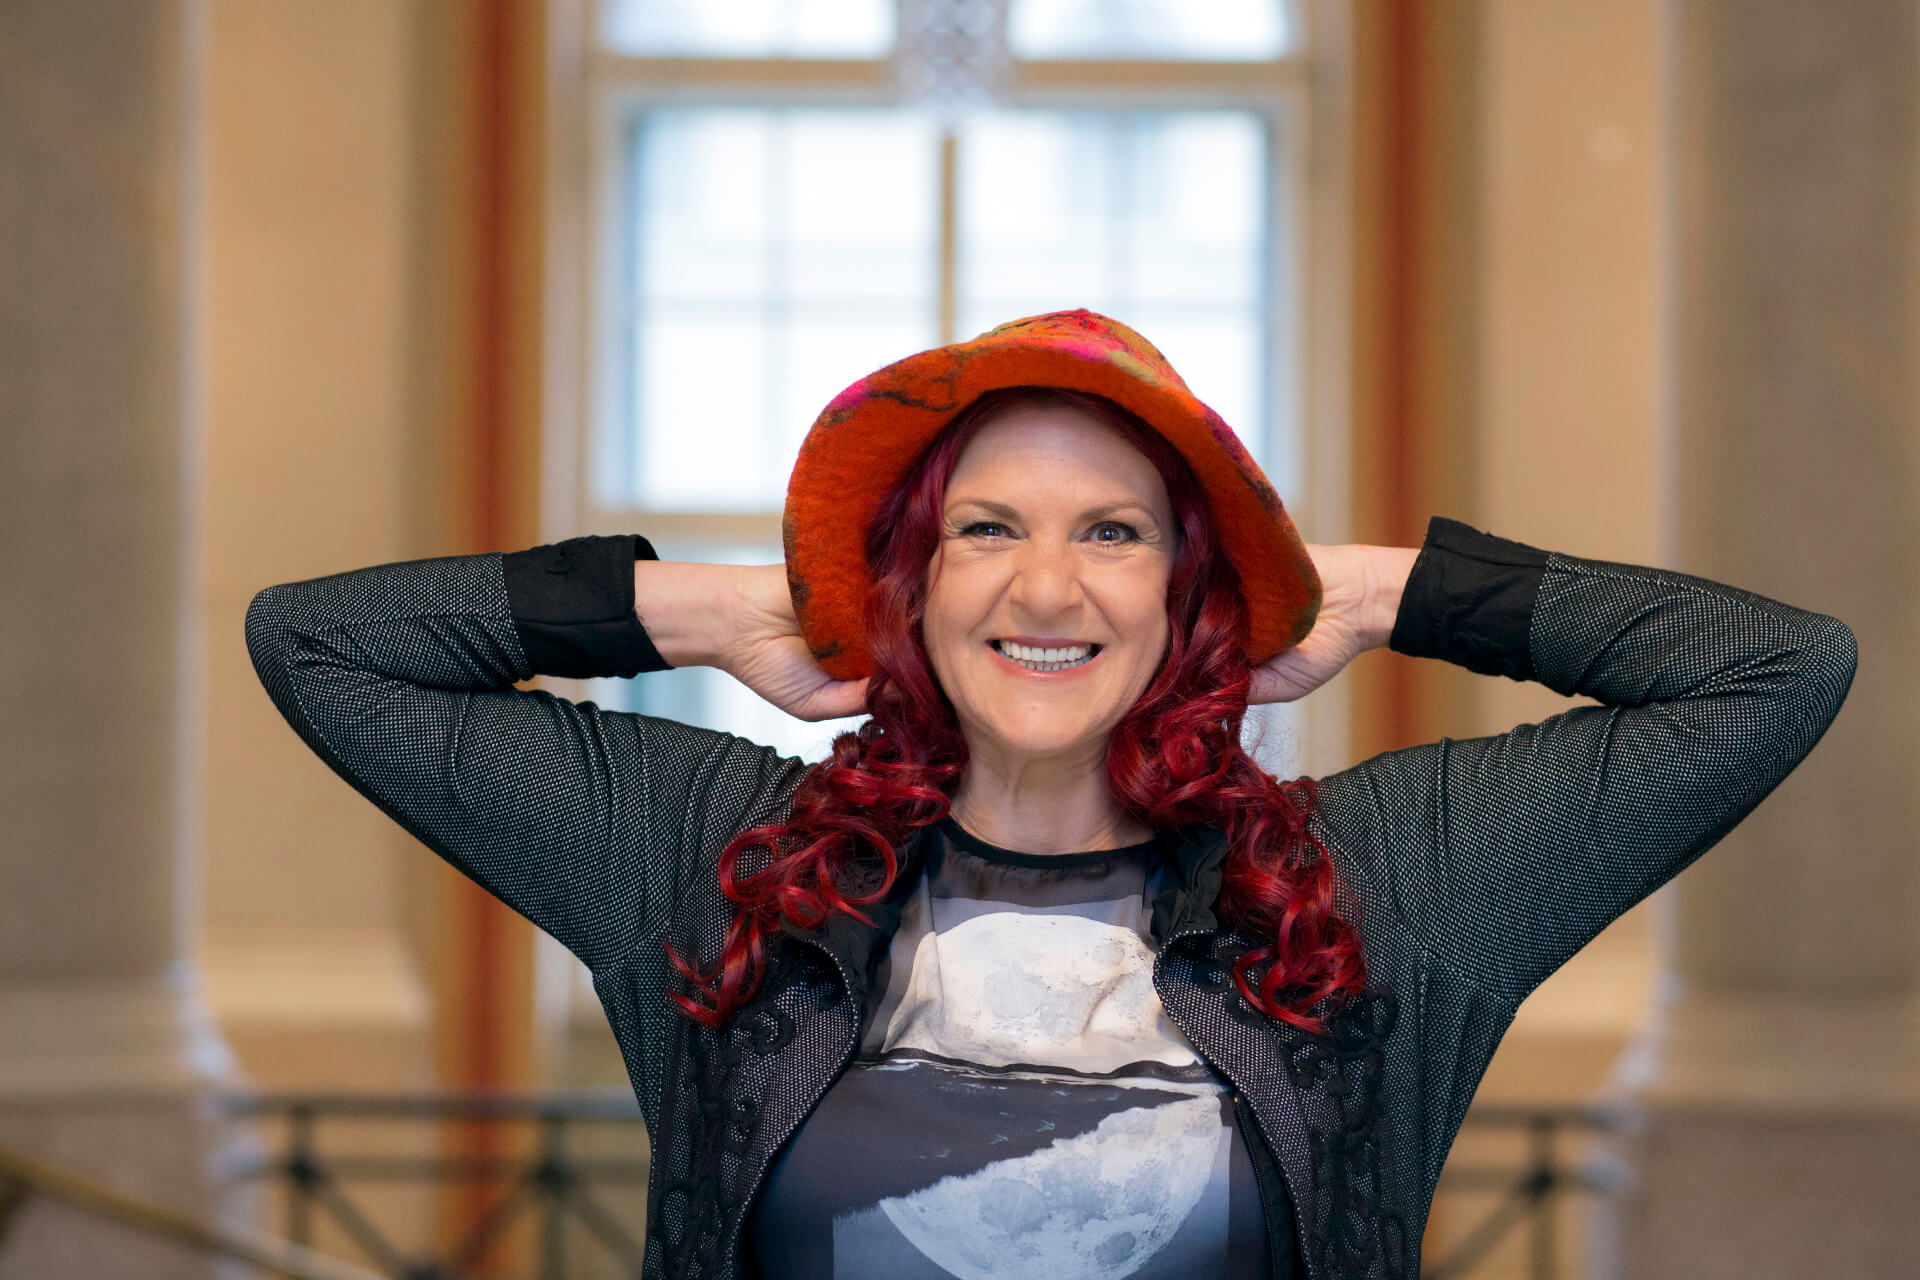 Manuela Nachtmann